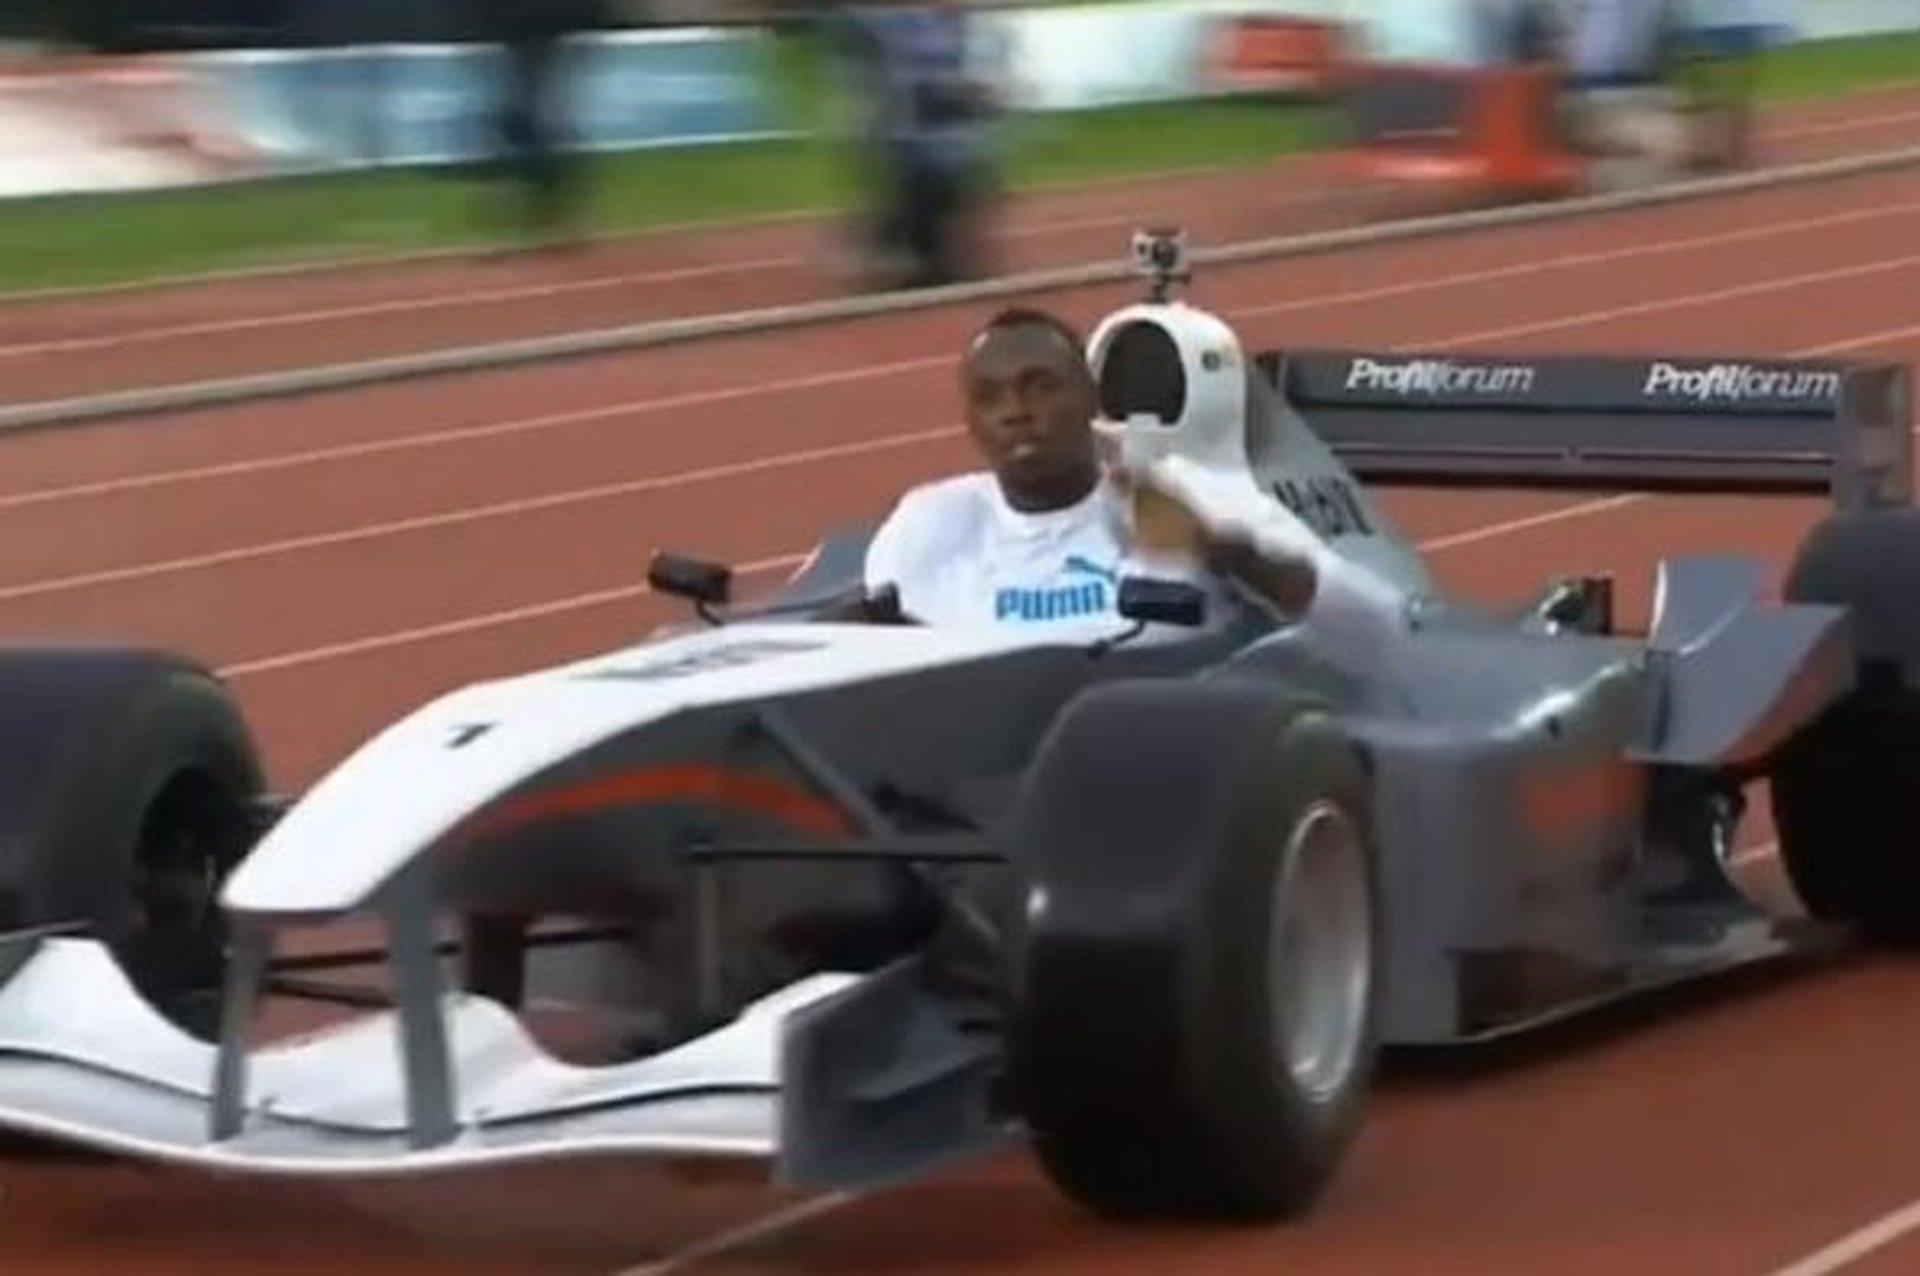 Usain Bolt Drives Around a Track in an F1 Car [video]